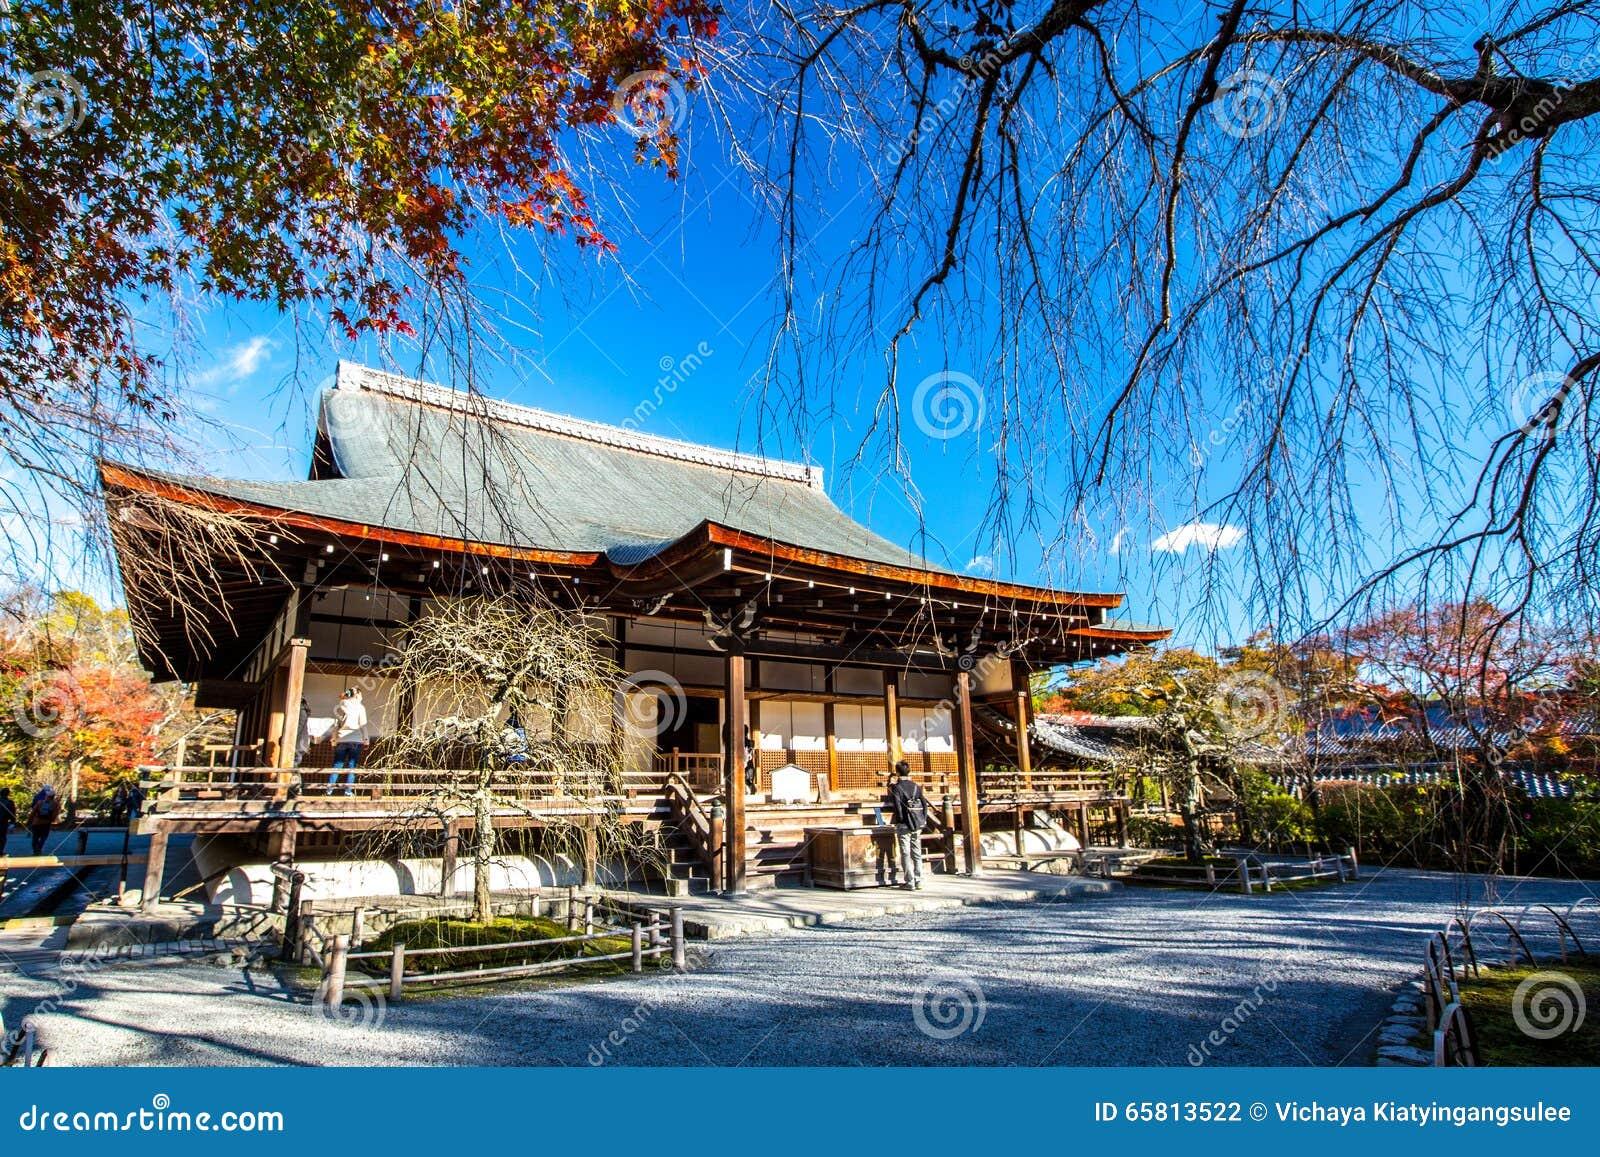 Tenryuji Temple in Kyoto has a Long History and a Beautiful Garden ...